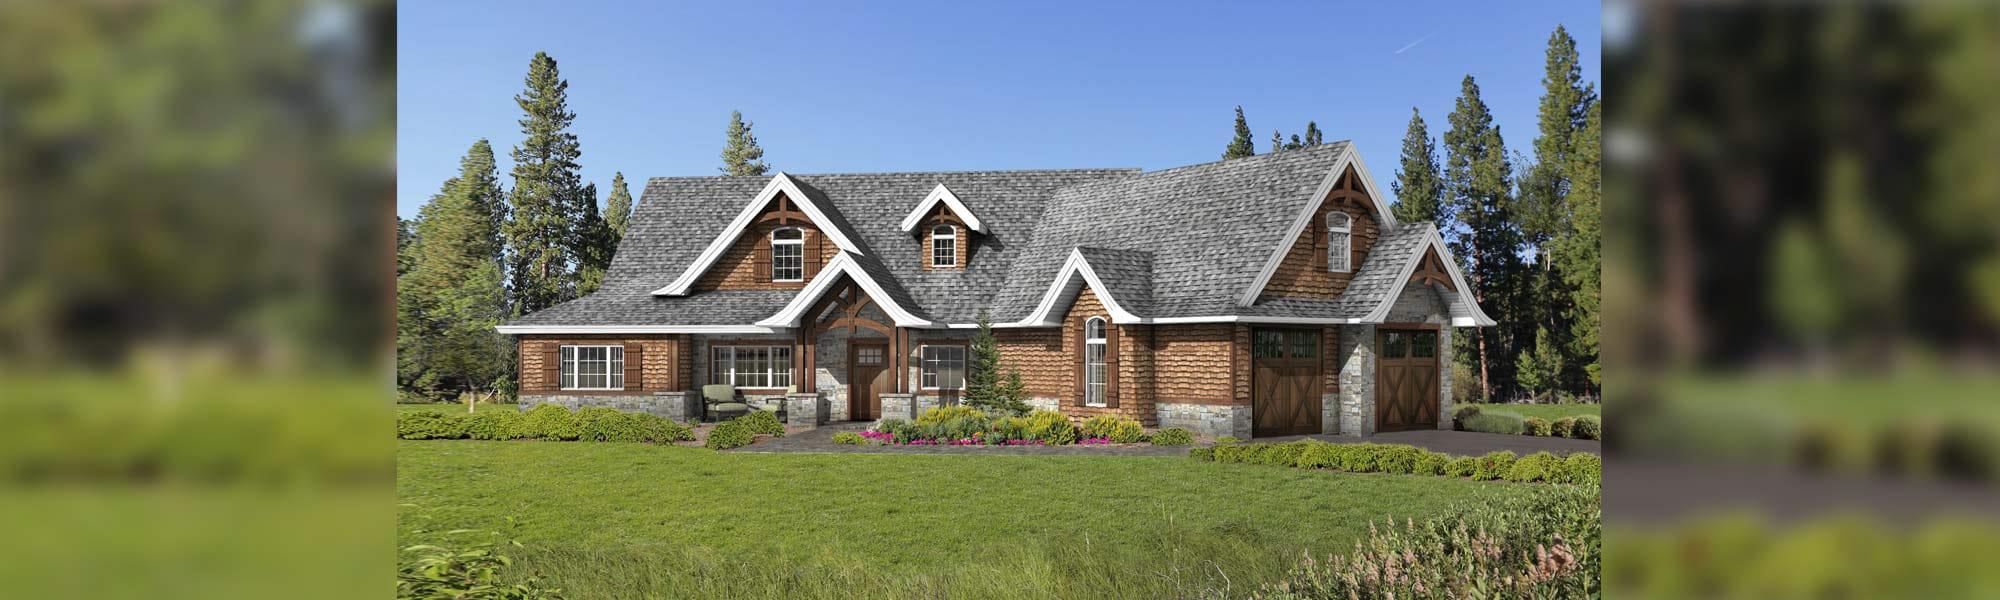 Ridgeway timber home floor plan